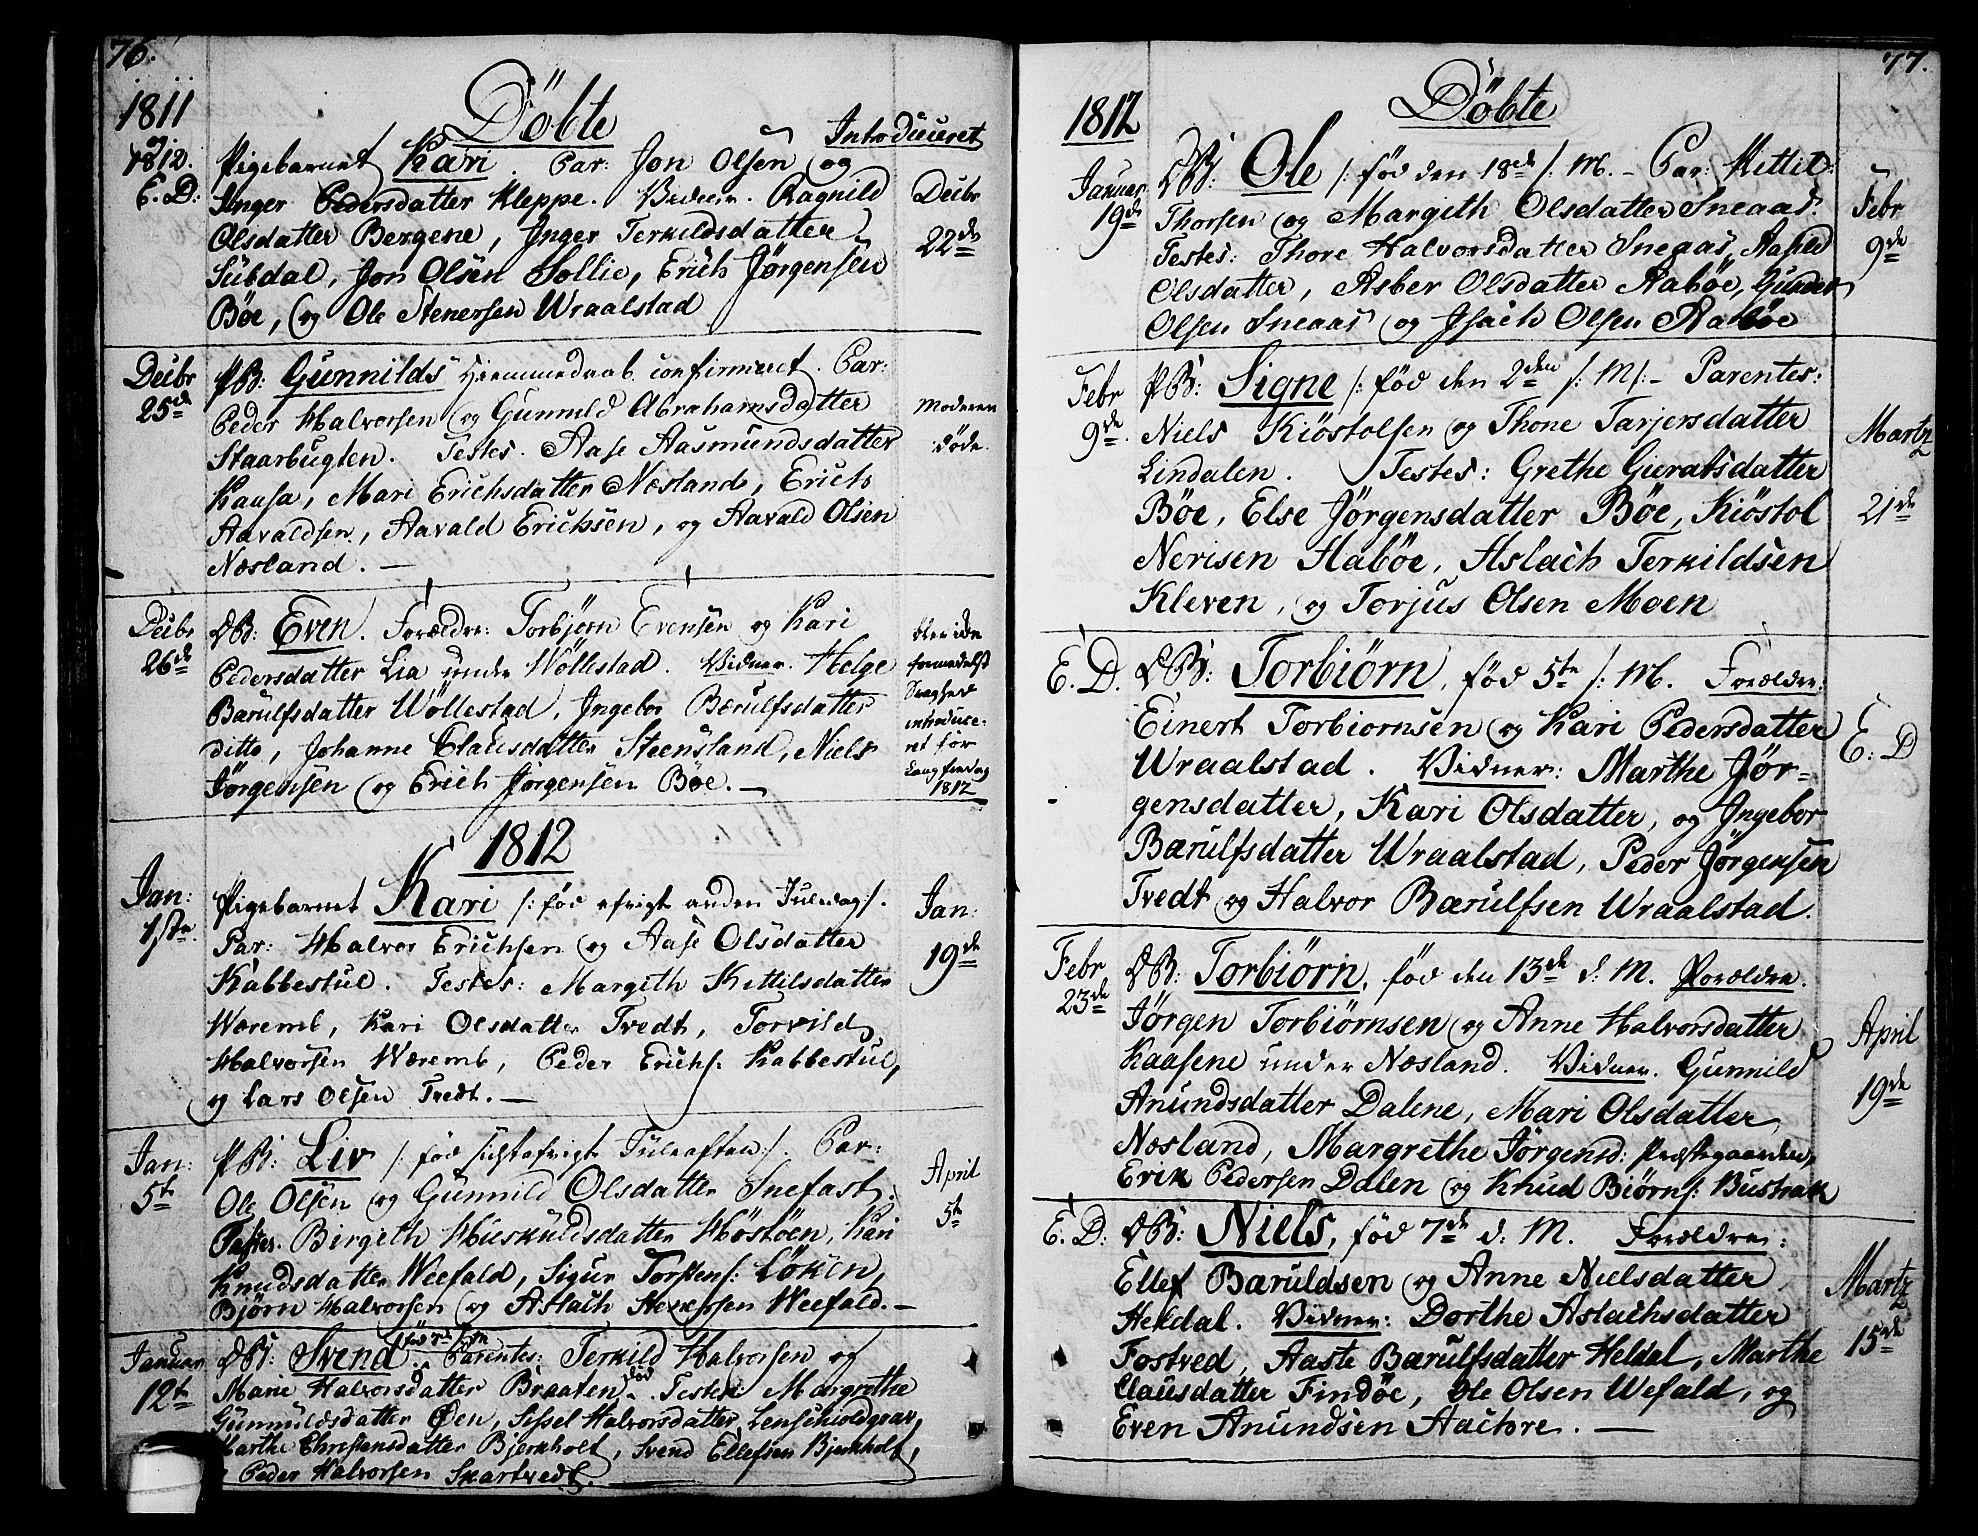 SAKO, Drangedal kirkebøker, F/Fa/L0004: Ministerialbok nr. 4, 1802-1814, s. 76-77